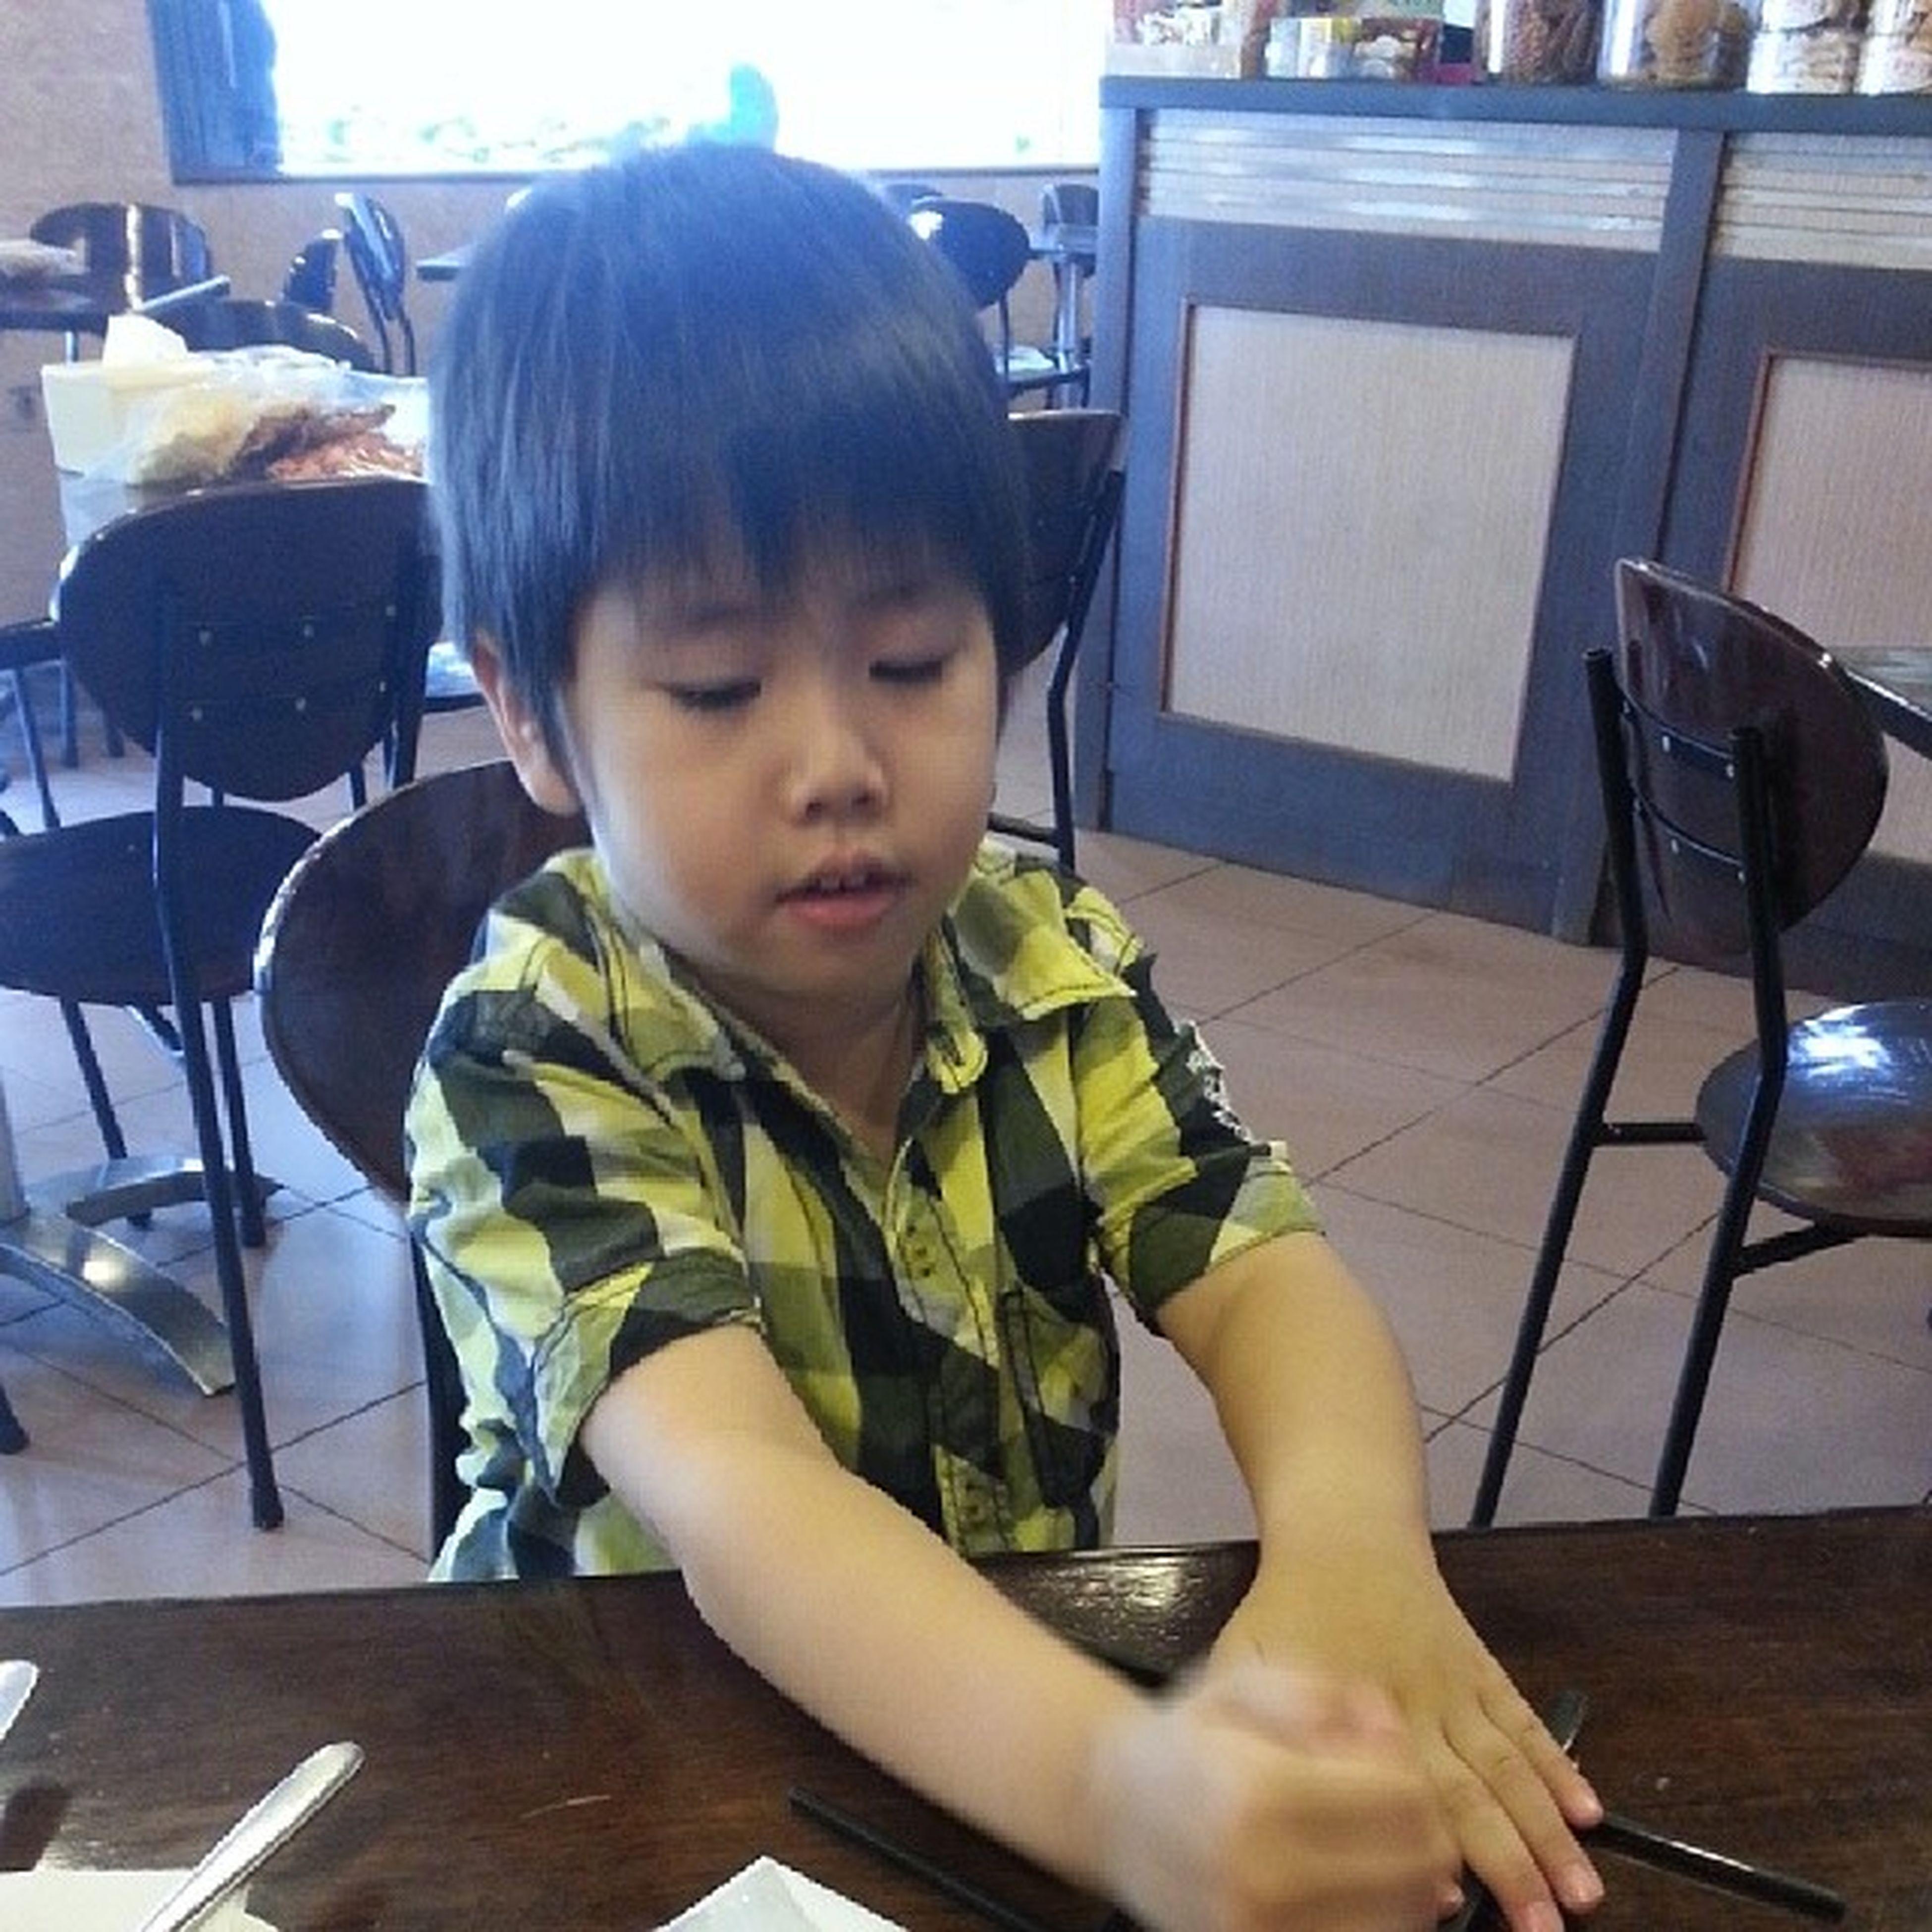 Always my naughty boy play chopstick...